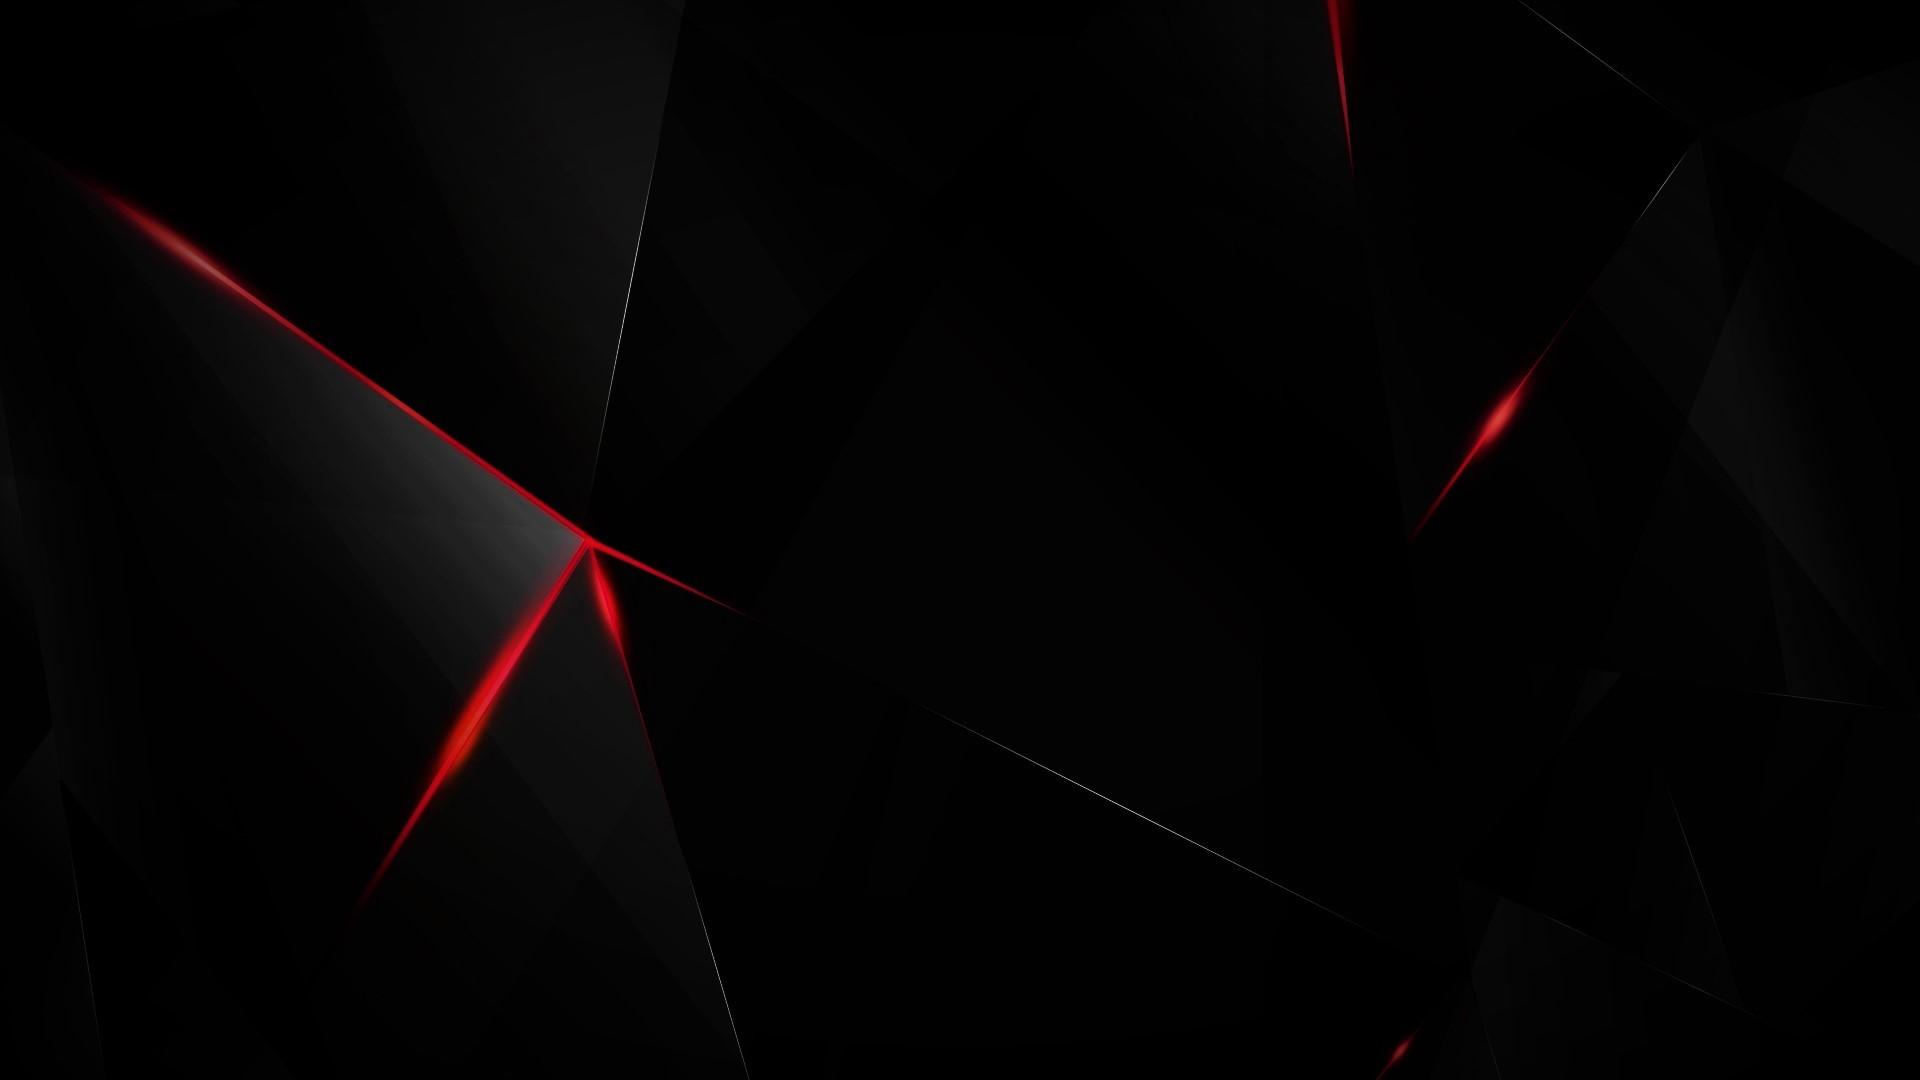 wallpaper : black, monochrome, dark, night, abstract, 3d, red, glass